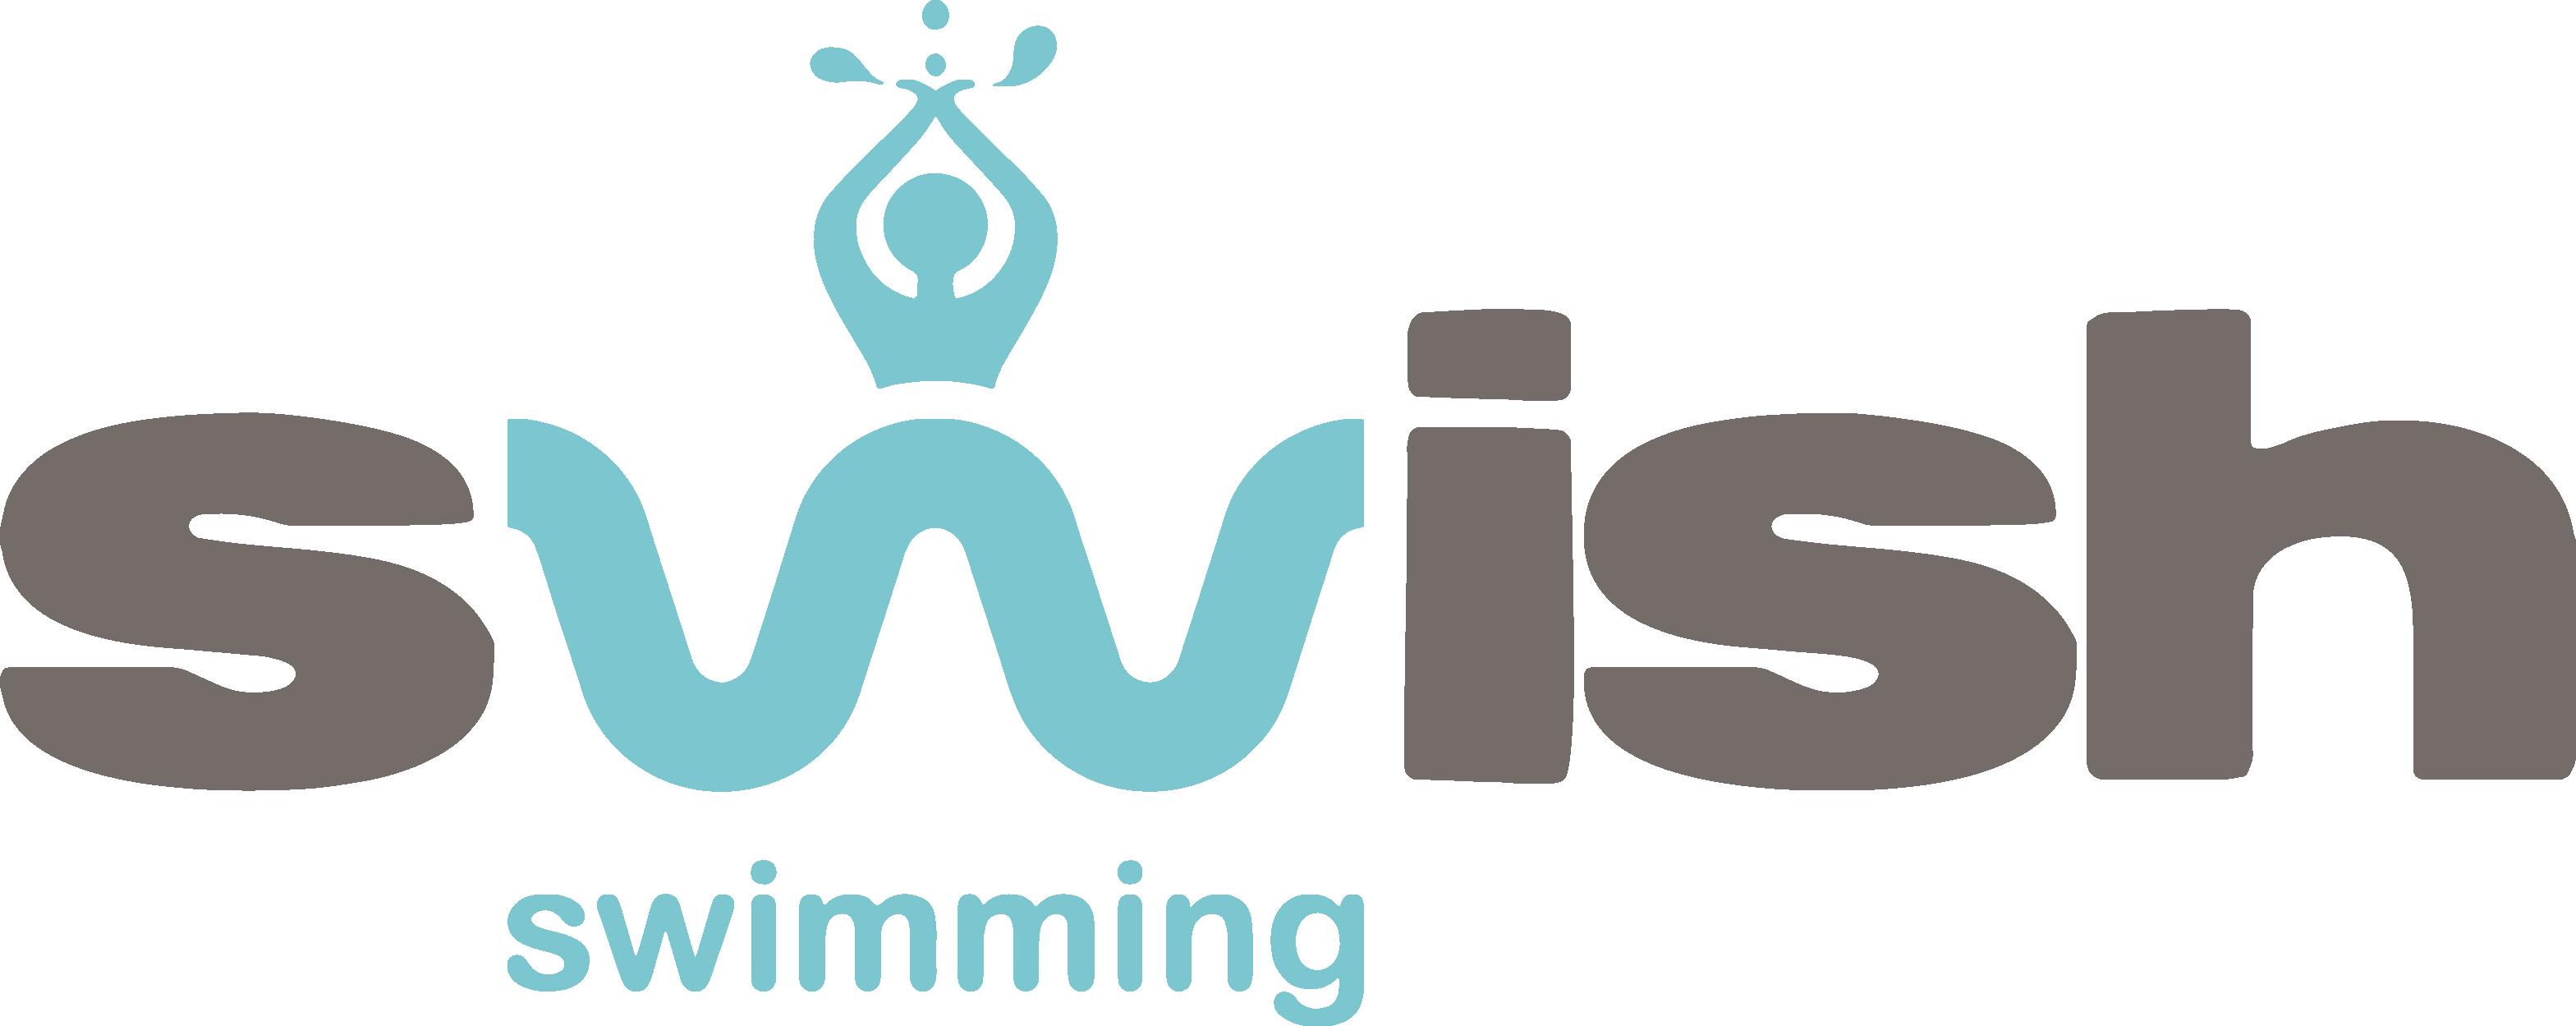 Soul Swim Pte Ltd trading as Swish! Swimming logo